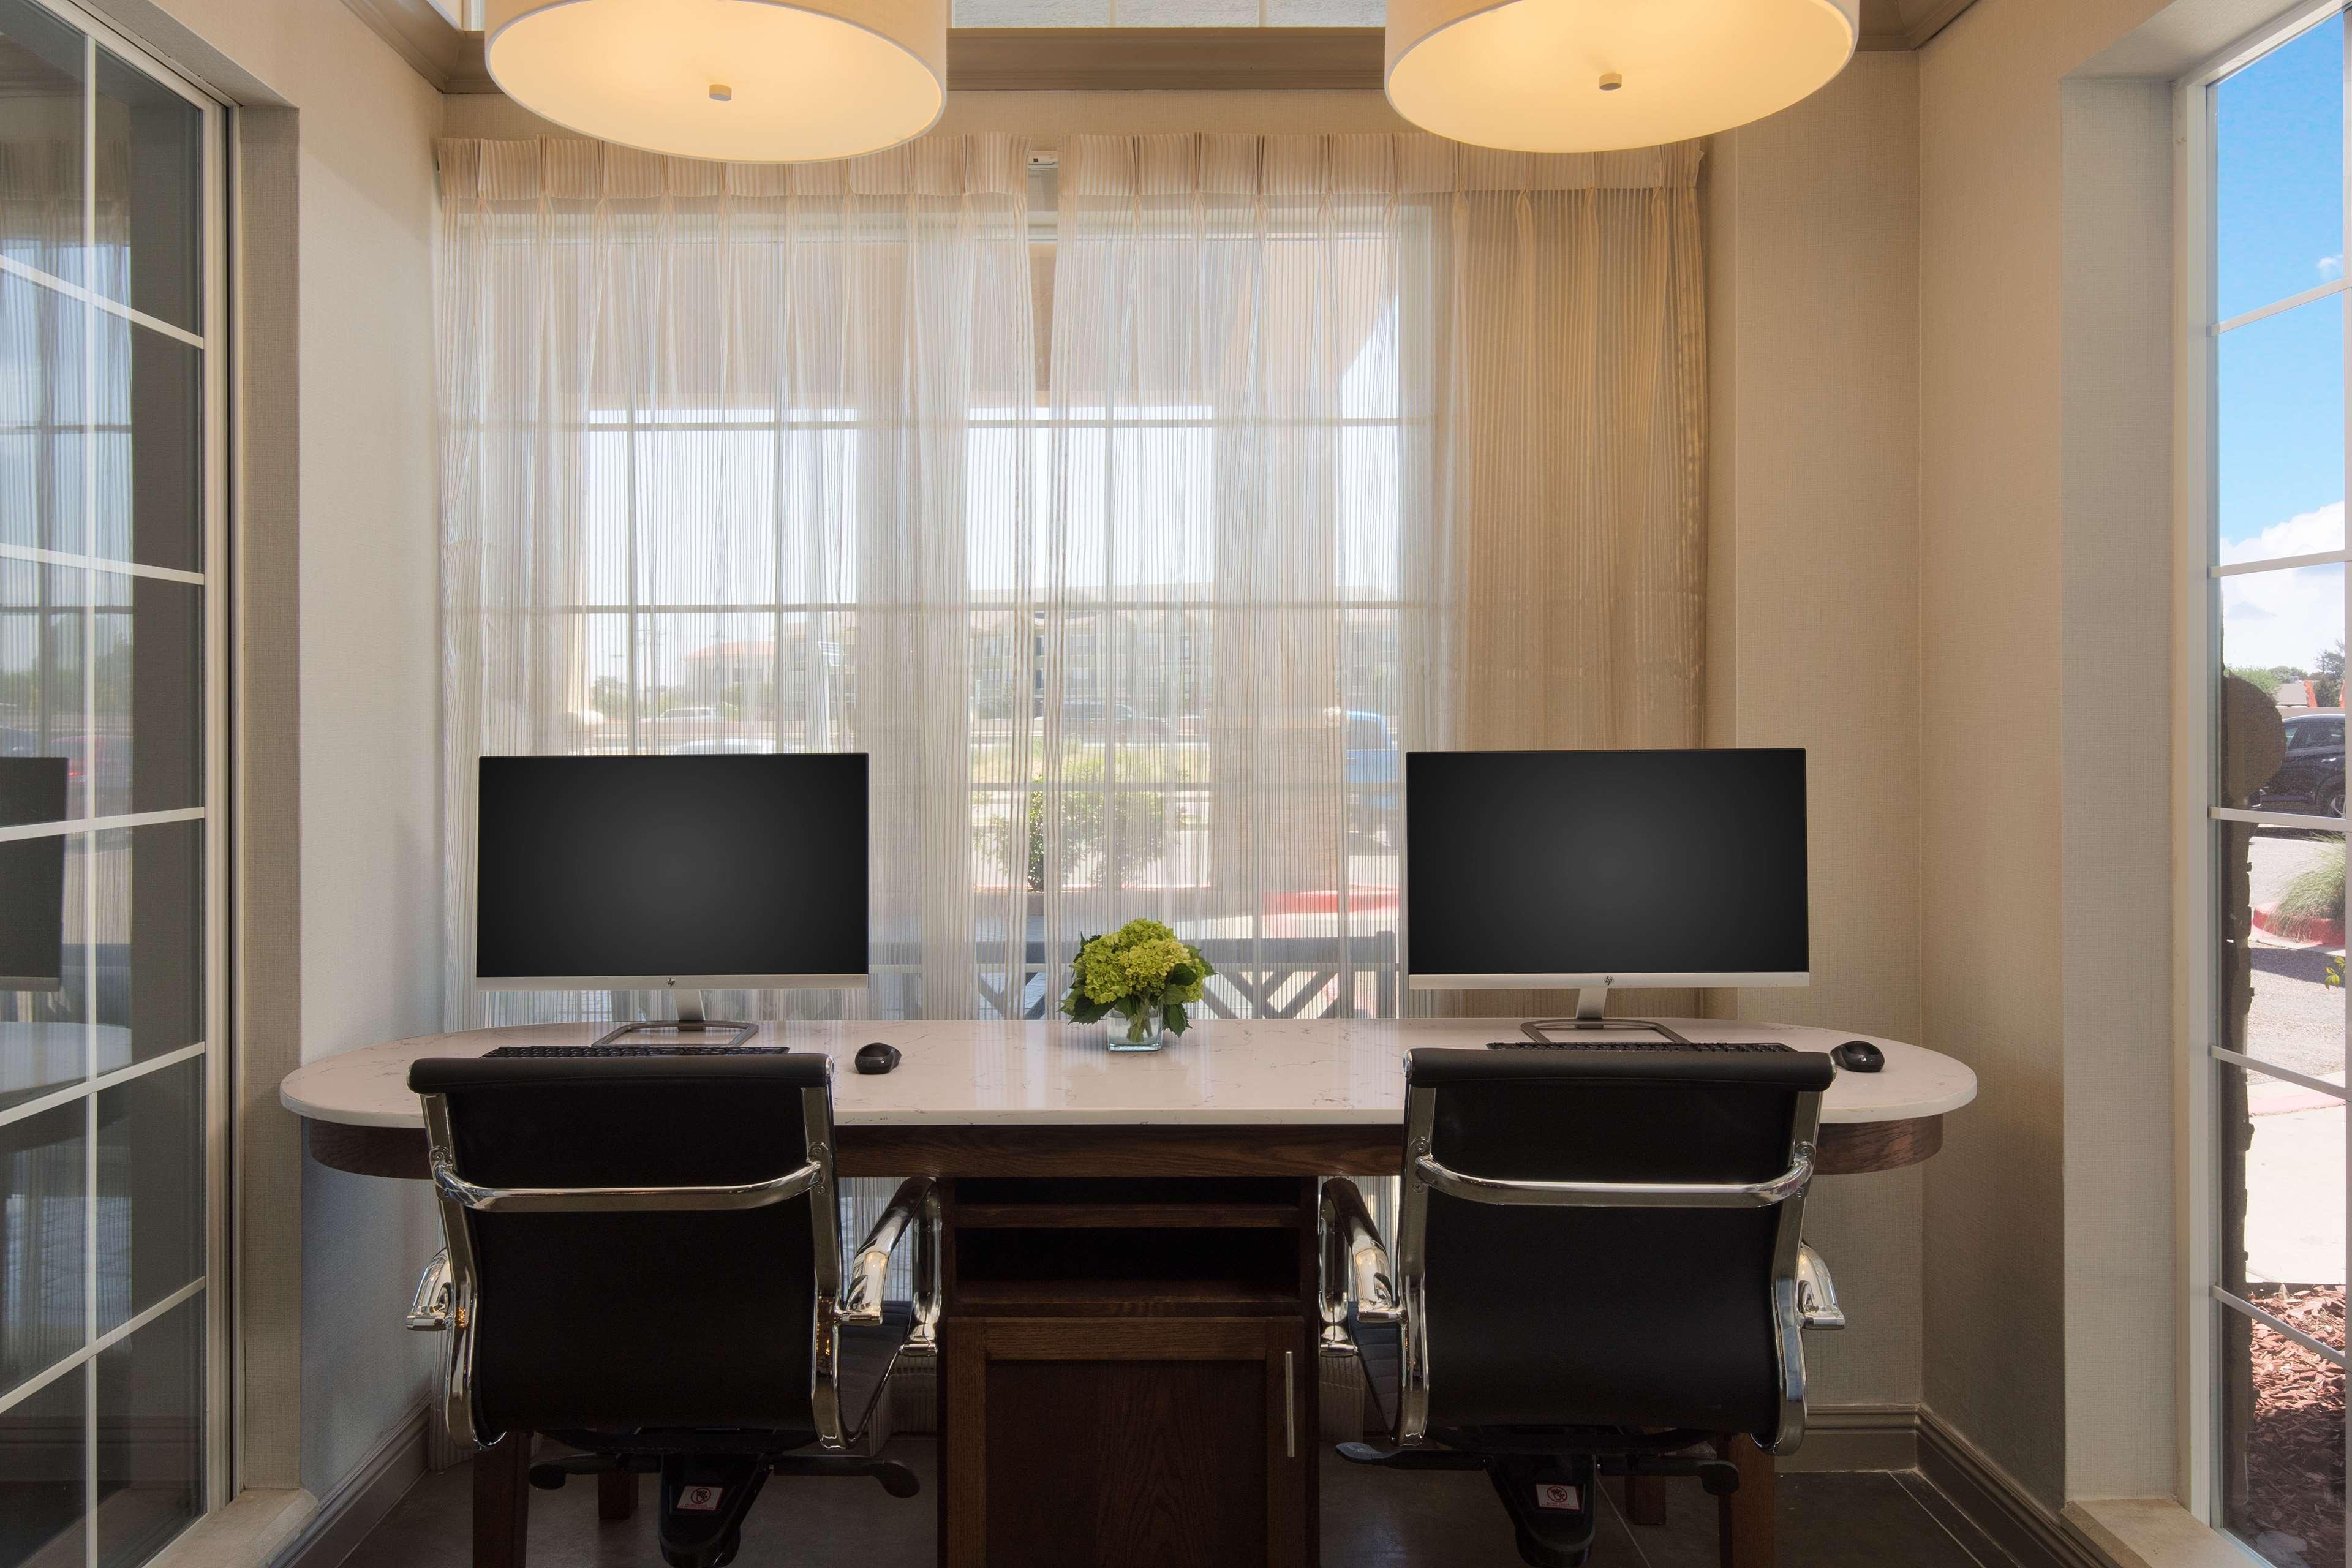 Homewood Suites by Hilton Lubbock image 22